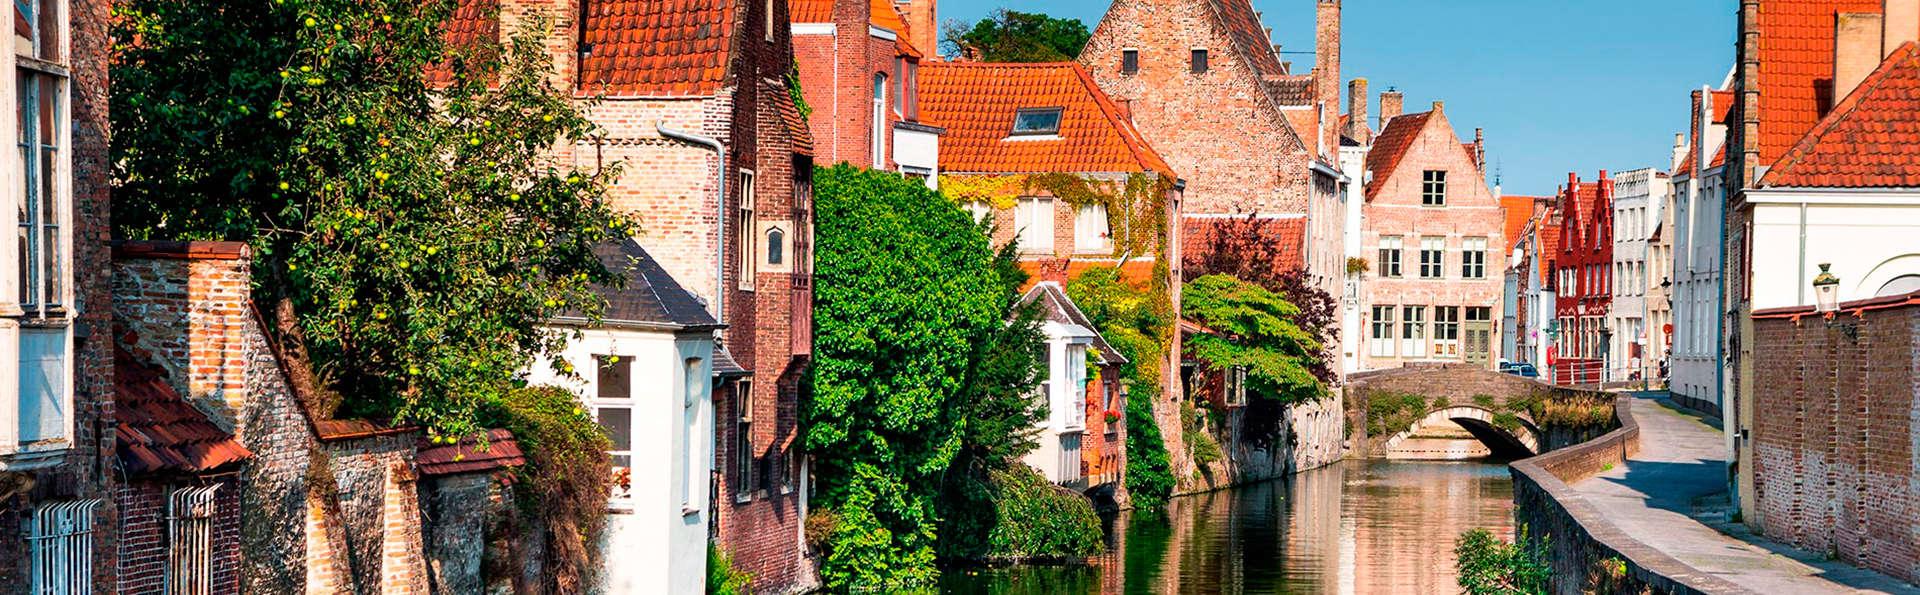 Radisson Blu Hotel Bruges - EDIT_BRUGGE__4_.jpg